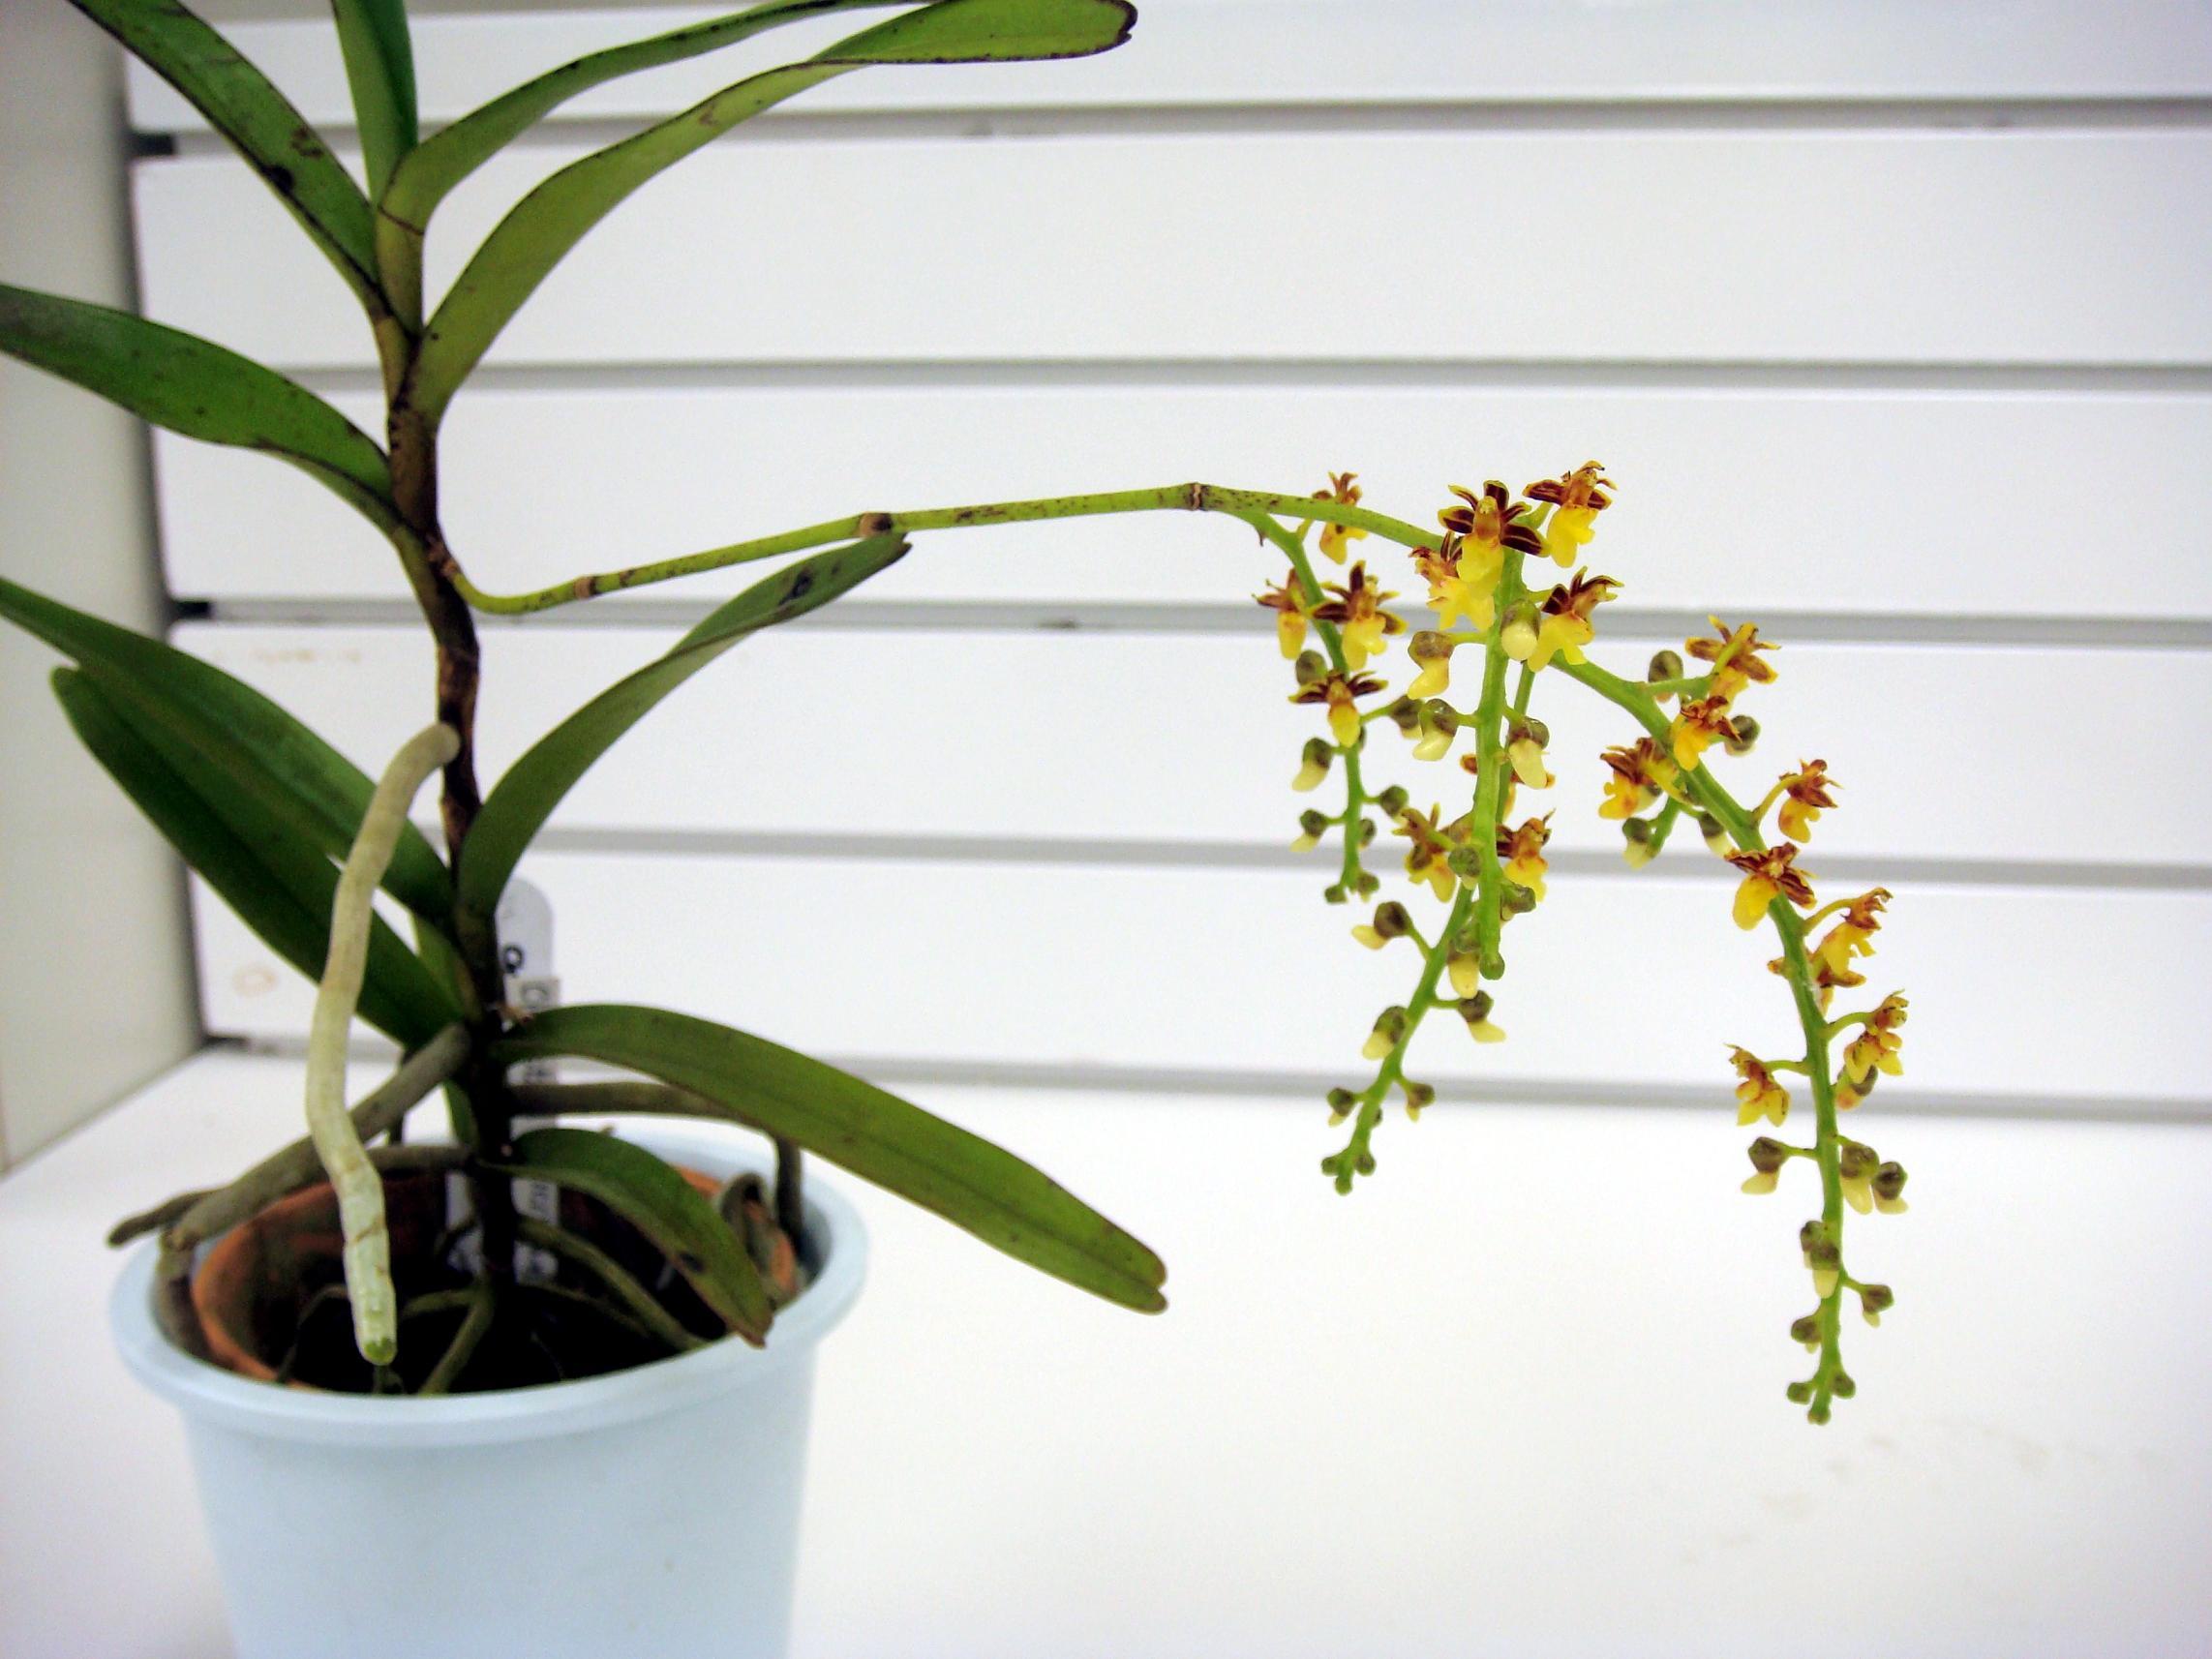 http://orchids.la.coocan.jp/Cleisostoma/Cleisostoma%20duplicilobum/DSC06714.JPG